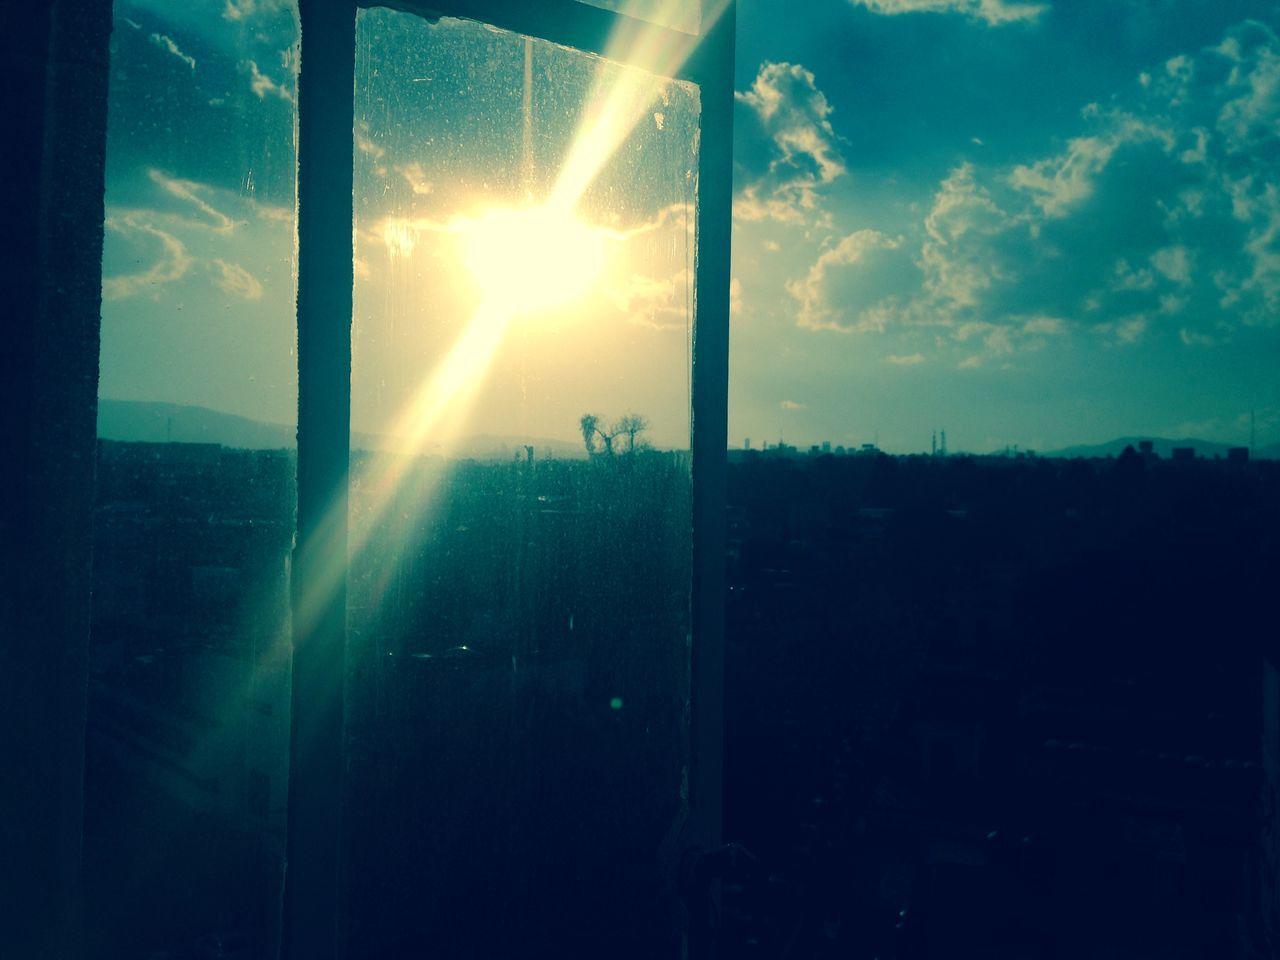 Silhouette Landscape Against Sky Seen Through Glass Window